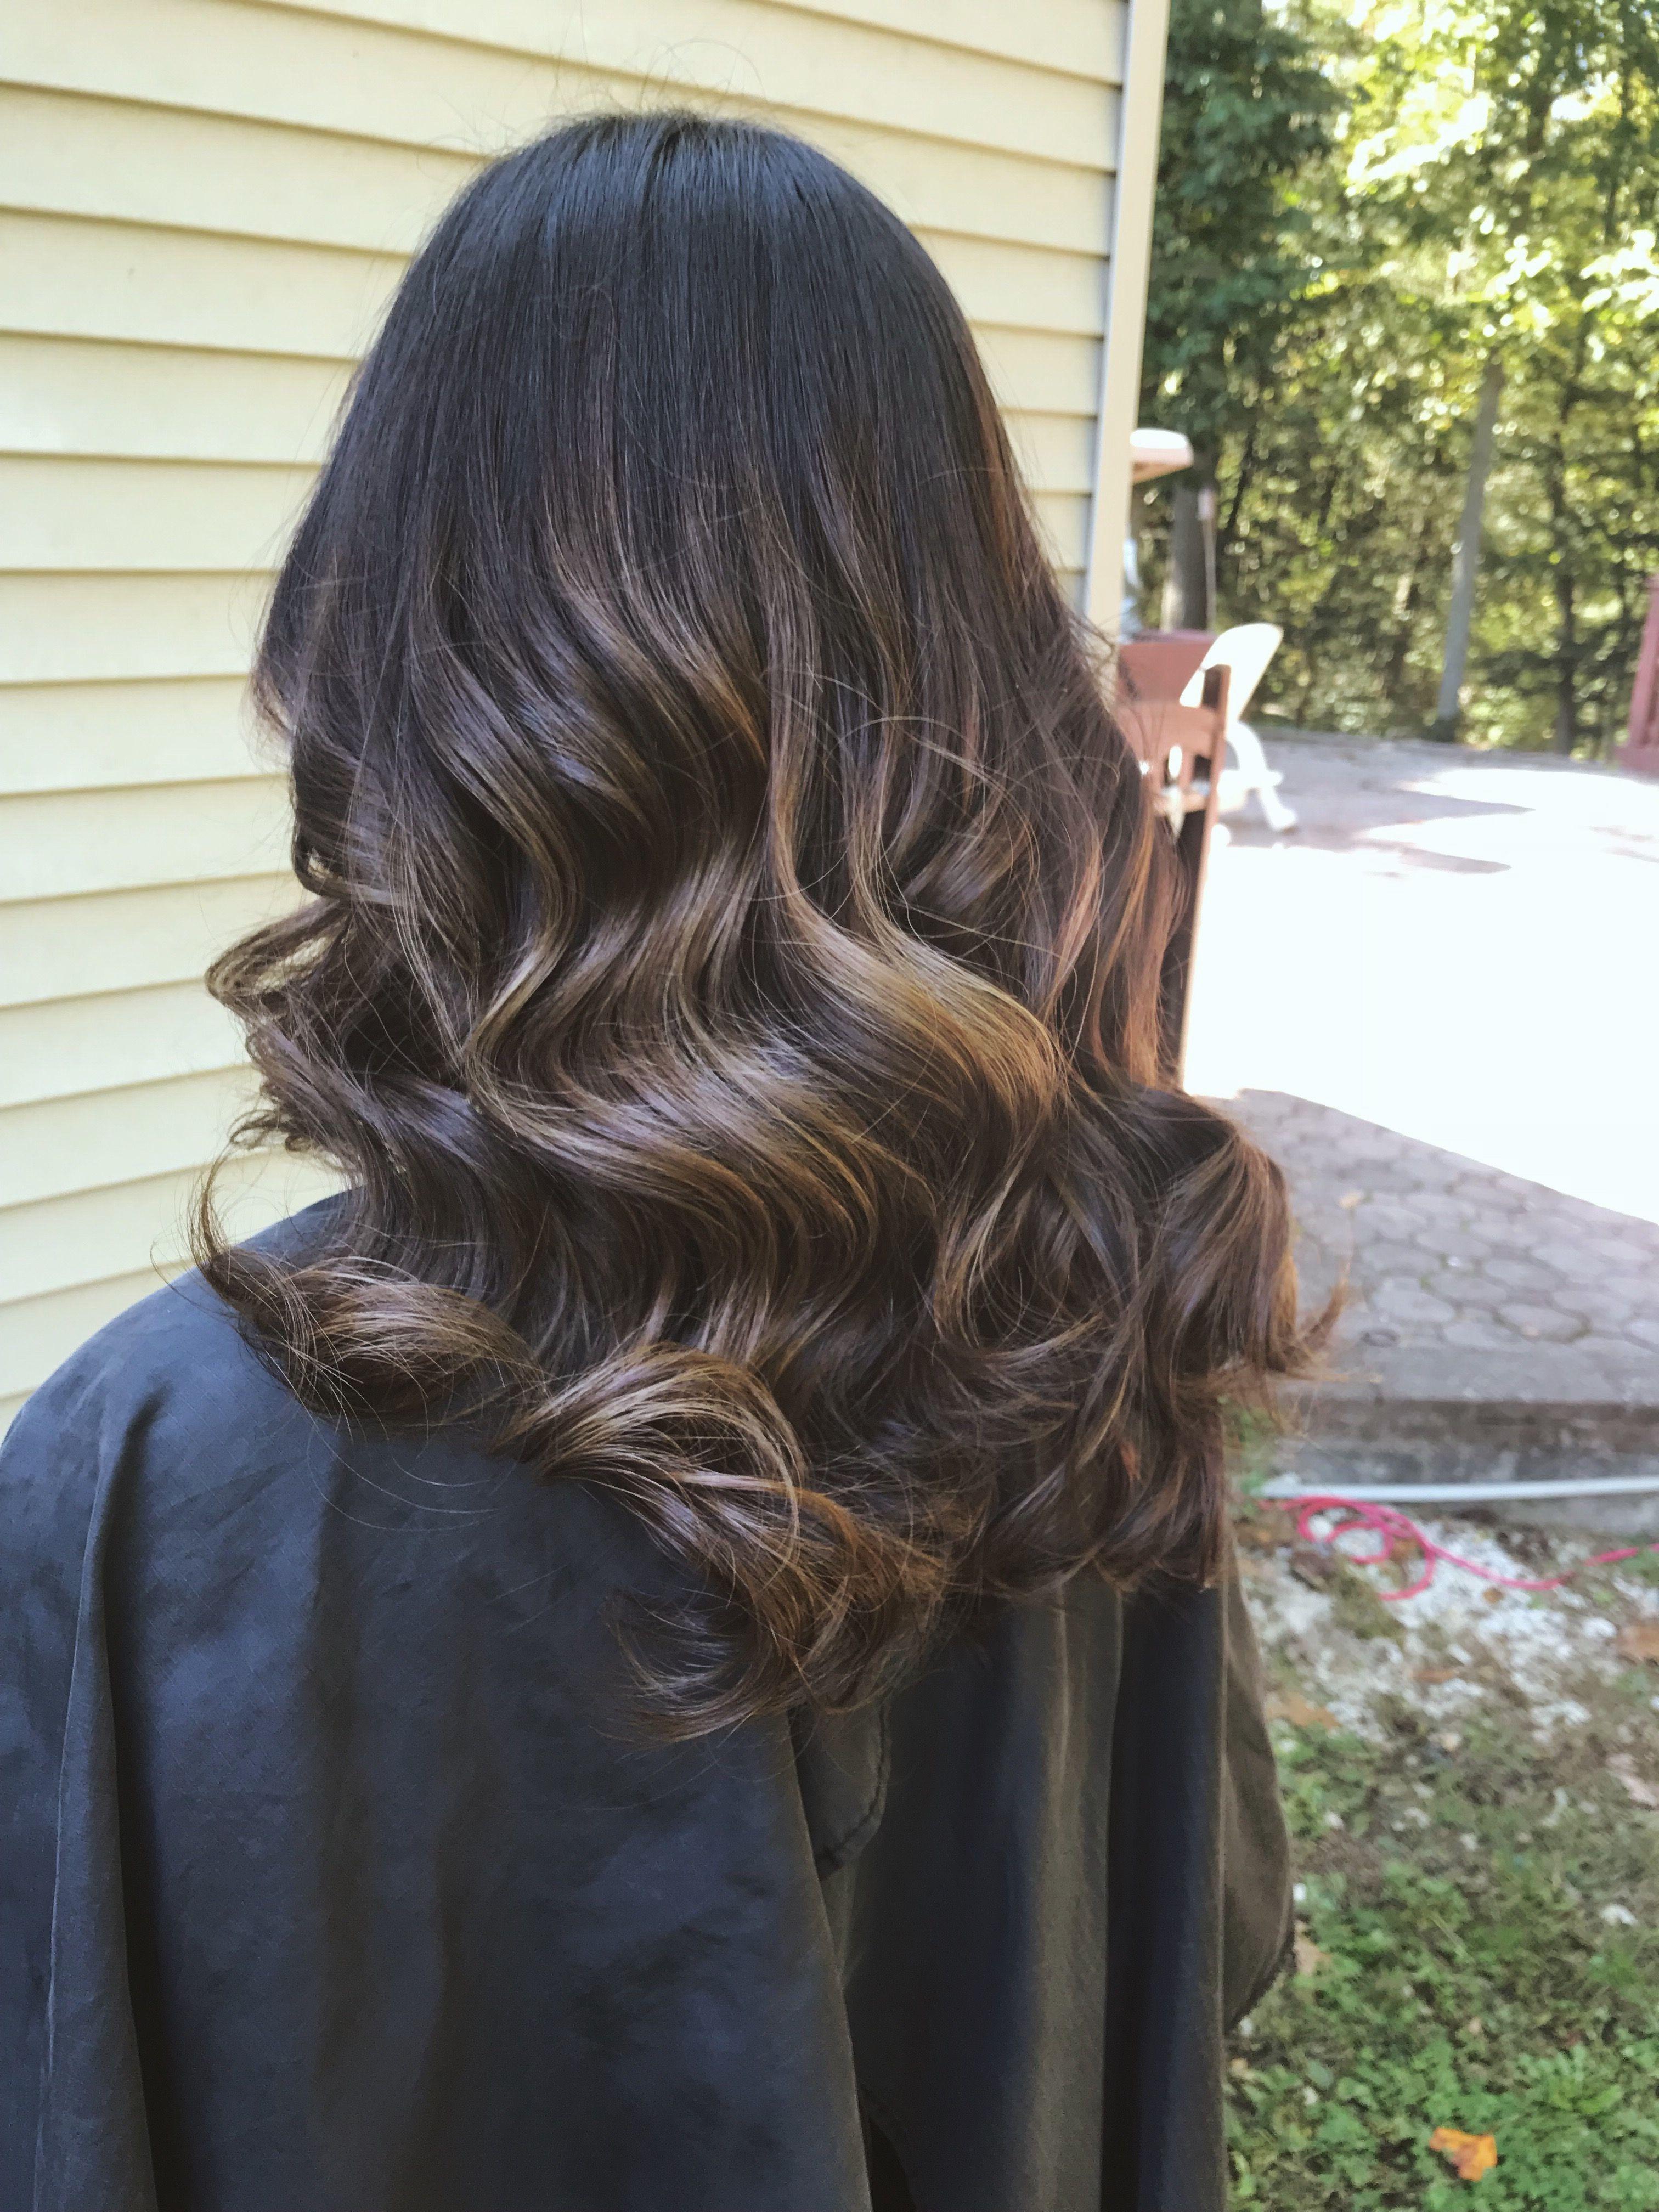 Ballayage Blond tout mocha/caramel partial balayage | hair | pinterest | partial balayage